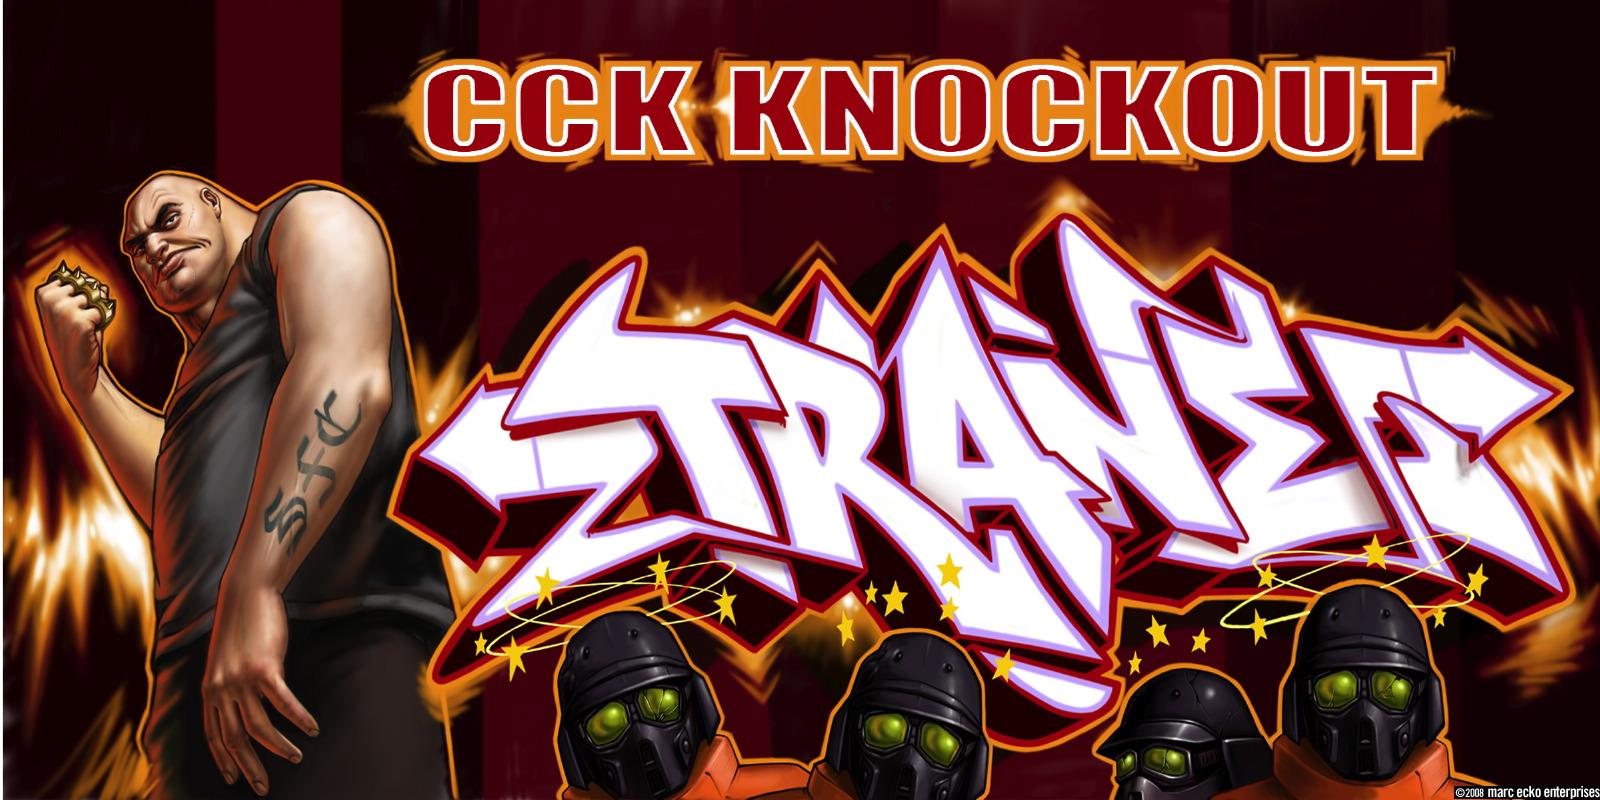 CCK Knockout Marc Ecko Getting Up wallpaper   ForWallpapercom 1600x800